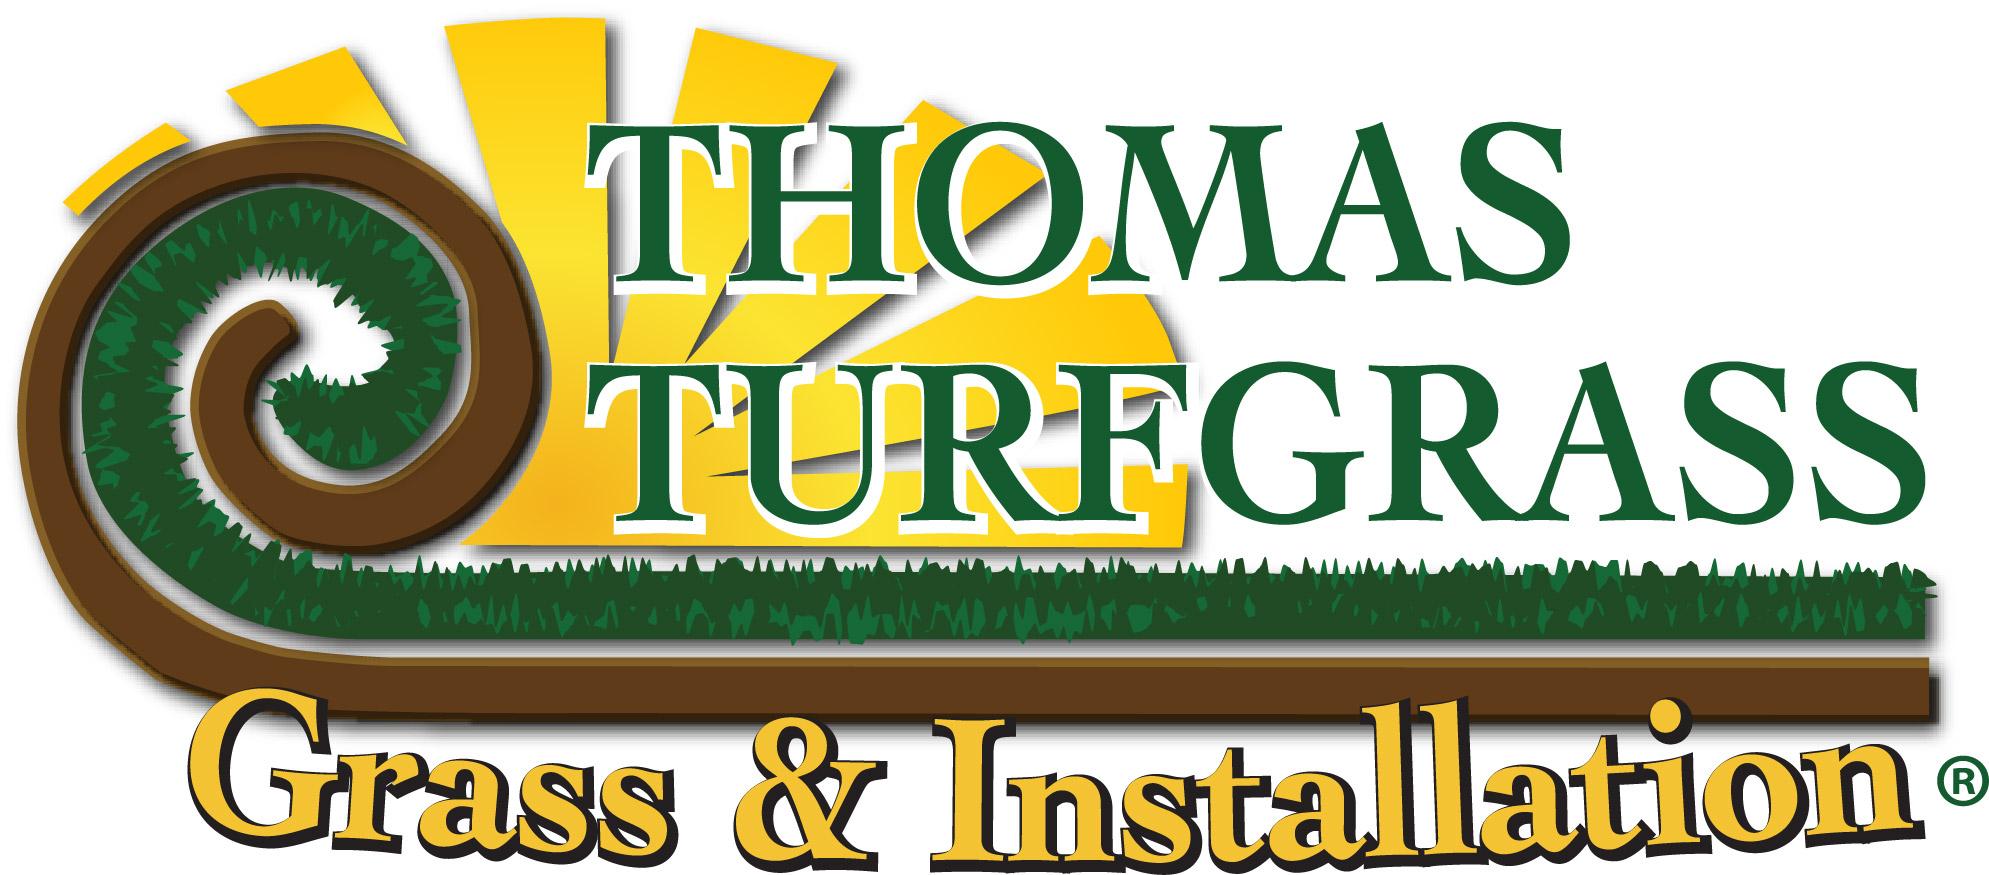 https://wtgcsa.net/wp-content/uploads/2018/06/Thomas-Turfgrass-Logo-F6.jpg